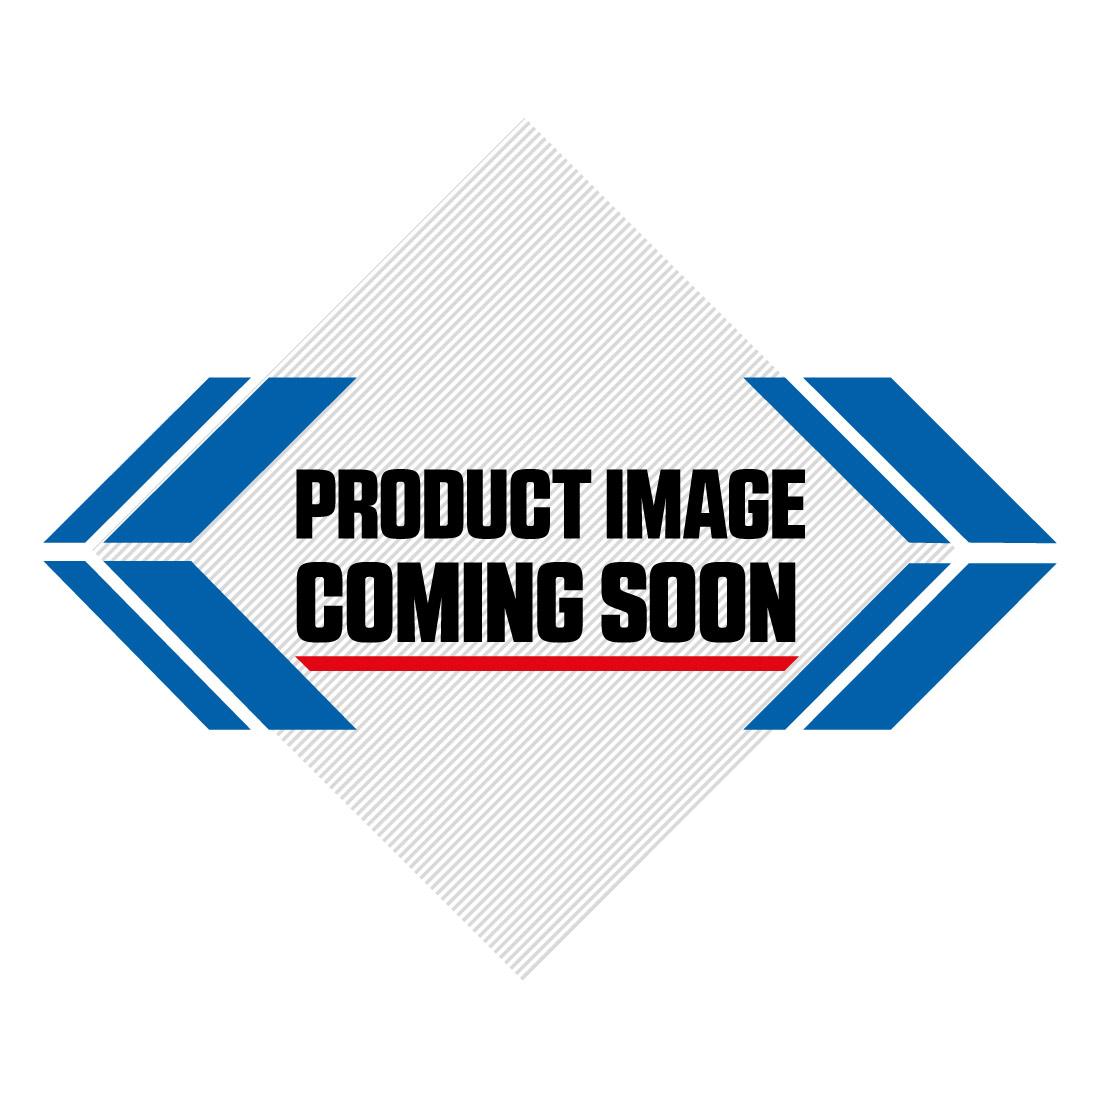 MDR STD Aluminium Clutch Lever Long KX 125 250 500 88-92 KXF RMZ 250 04 YZ 125 250 85-99 RM 125 250